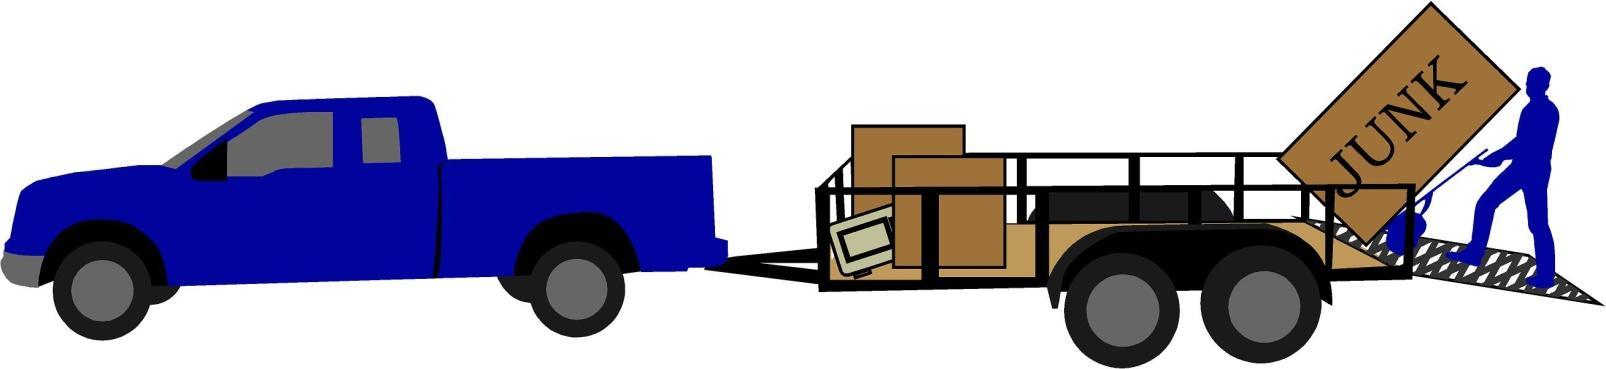 What We Remove | Junk Removal Serving McDonough, Stockbridge ...